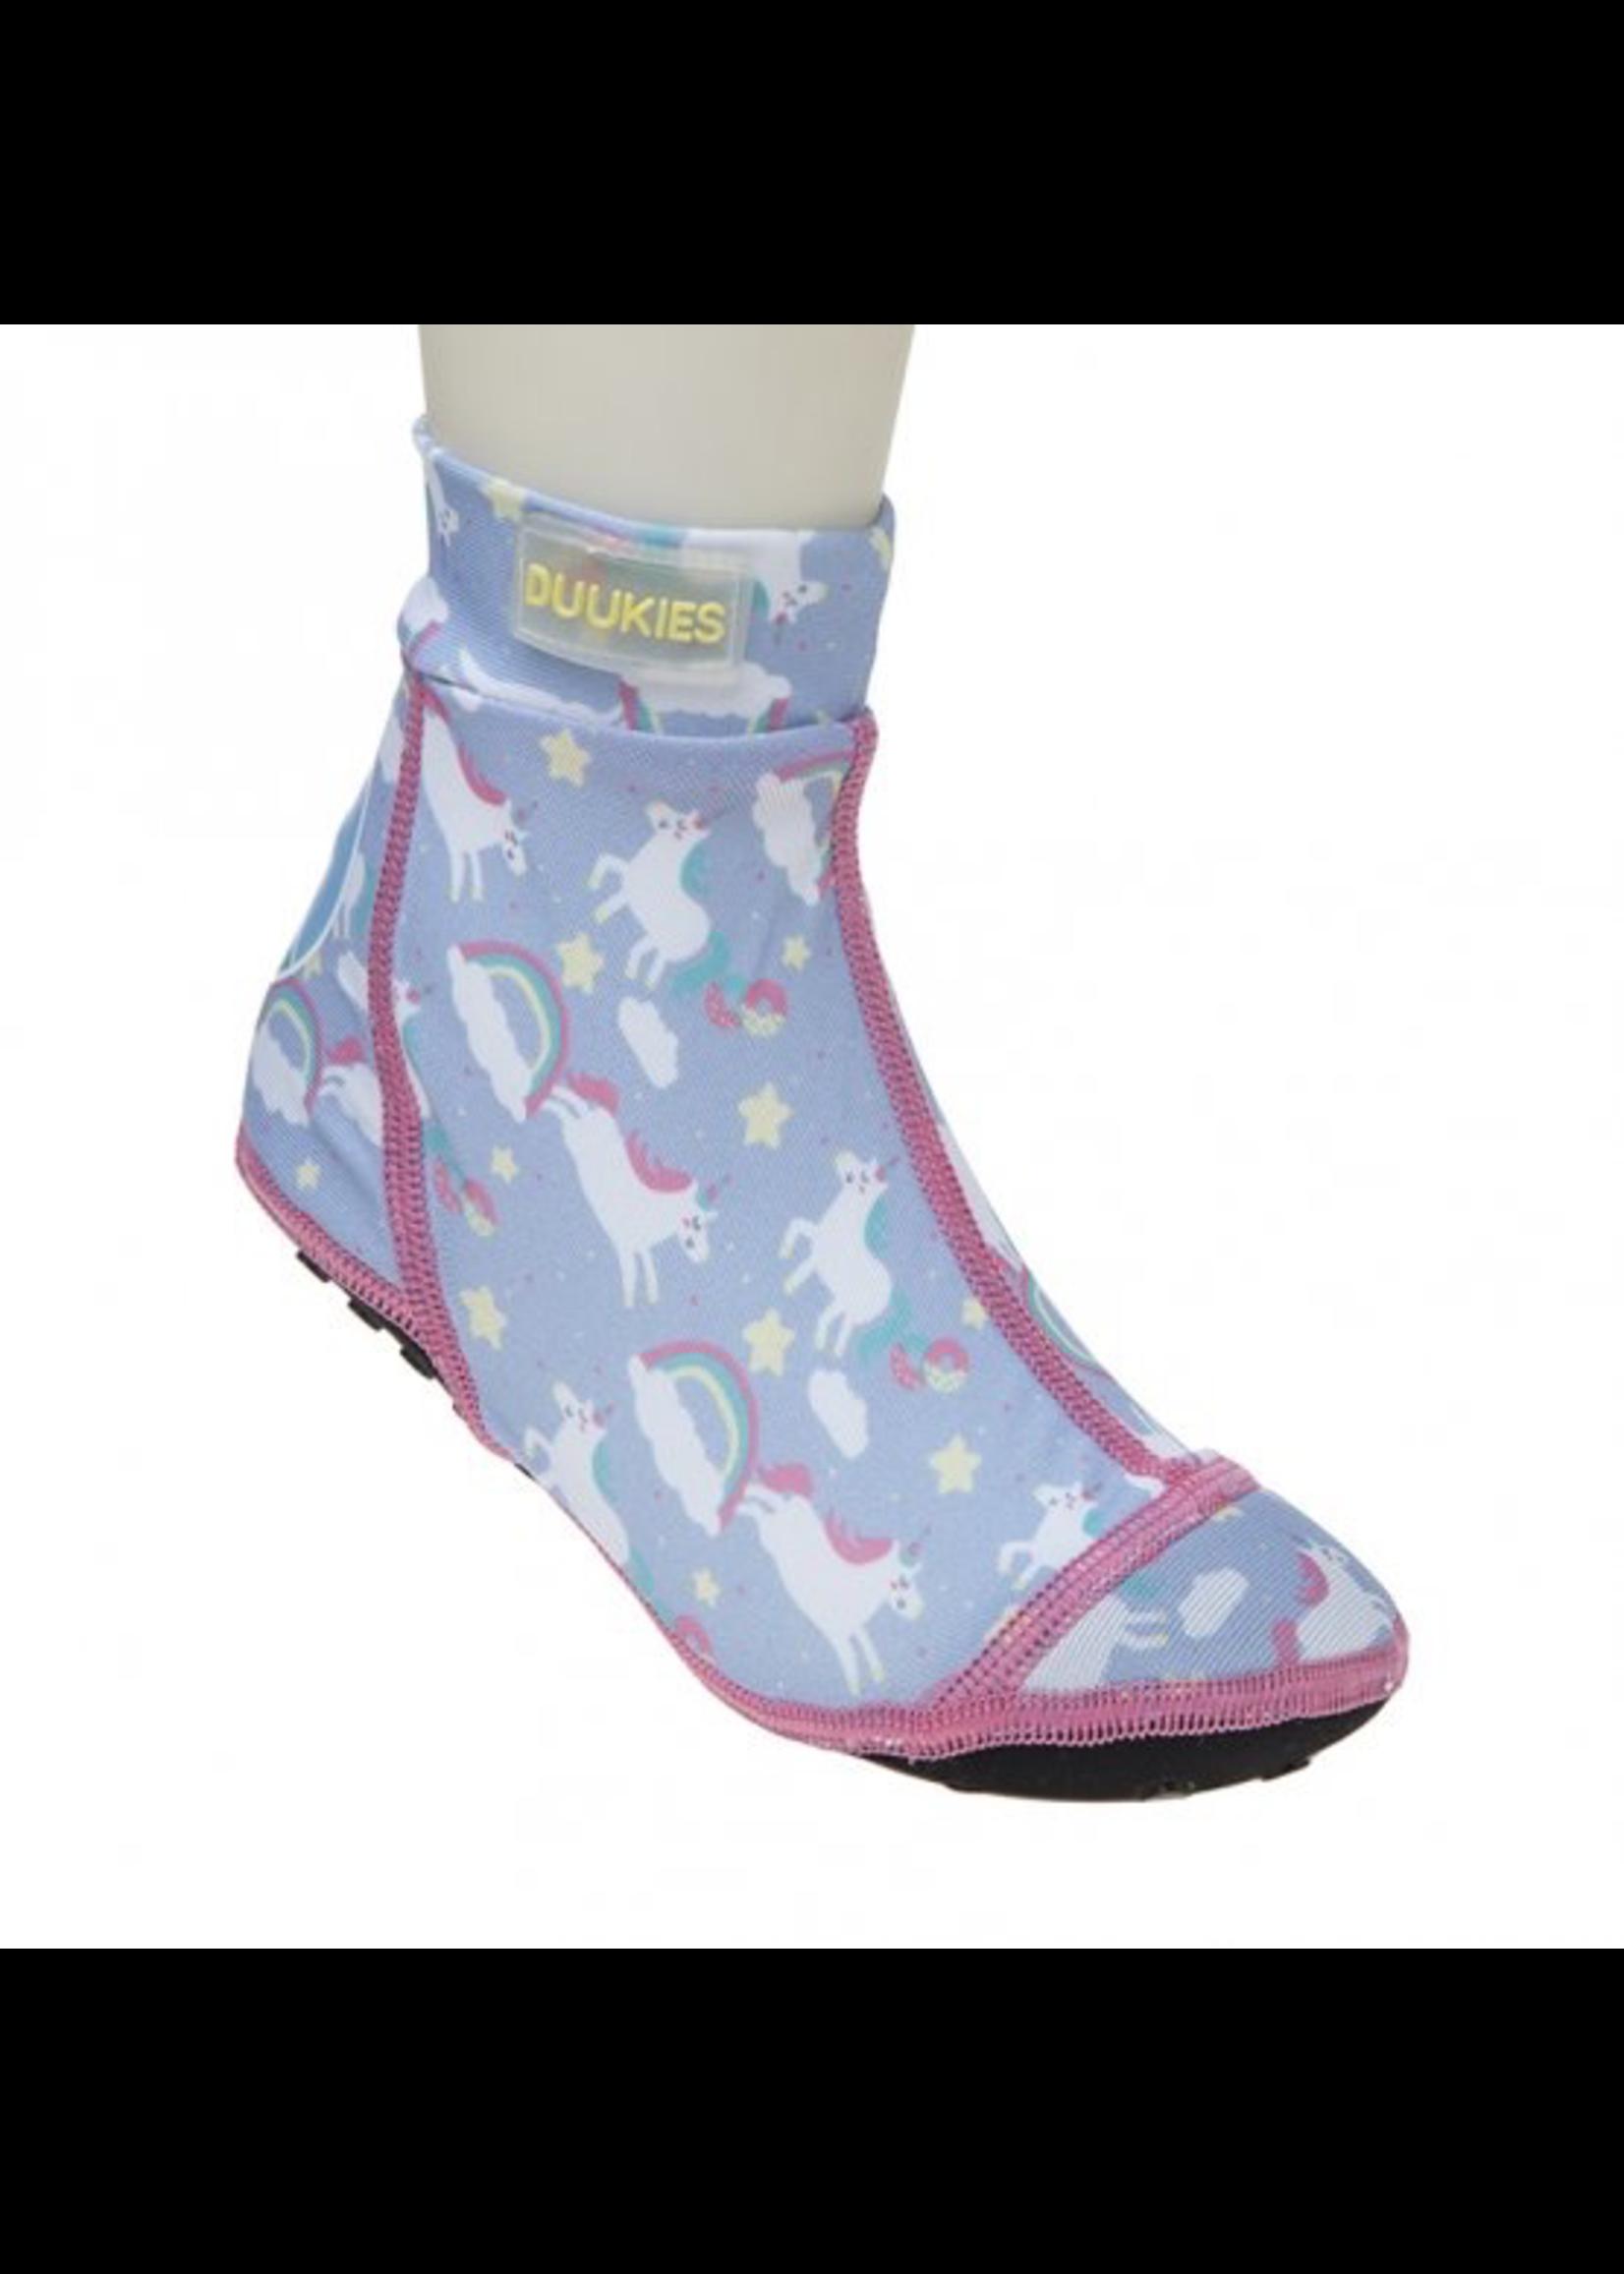 Duukies Duukies, Beach Socks for Girl - P-54910